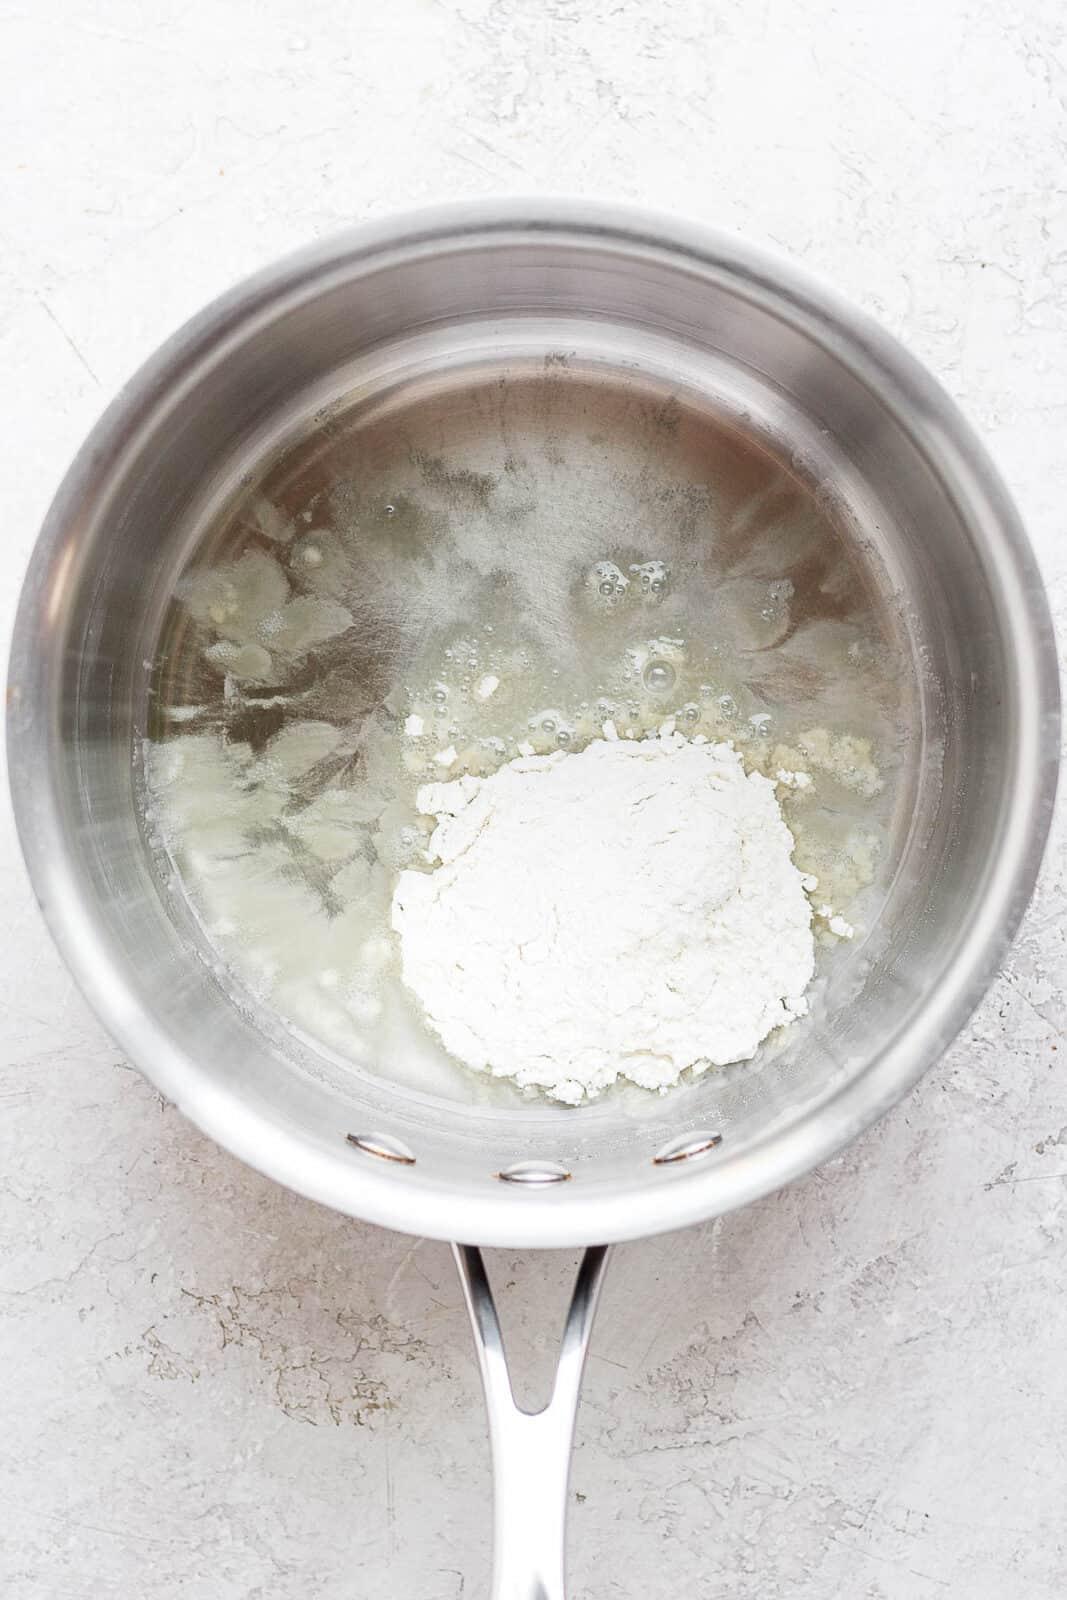 Olive oil and flour in a medium saucepan.